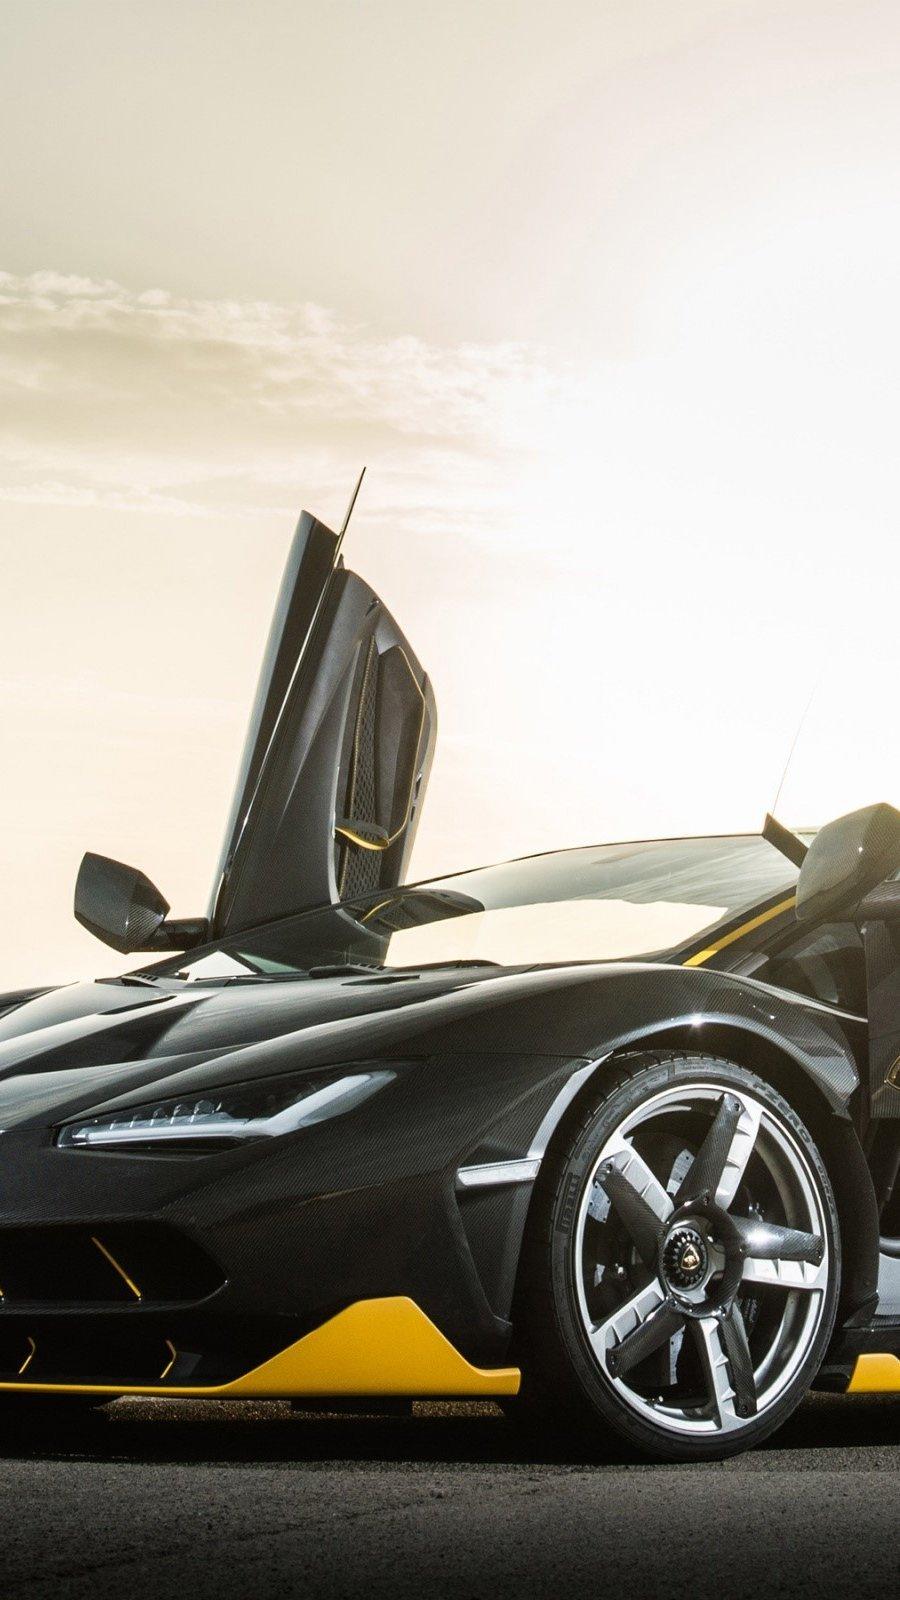 Wallpaper Lamborghini Centenario Hypercar Vertical